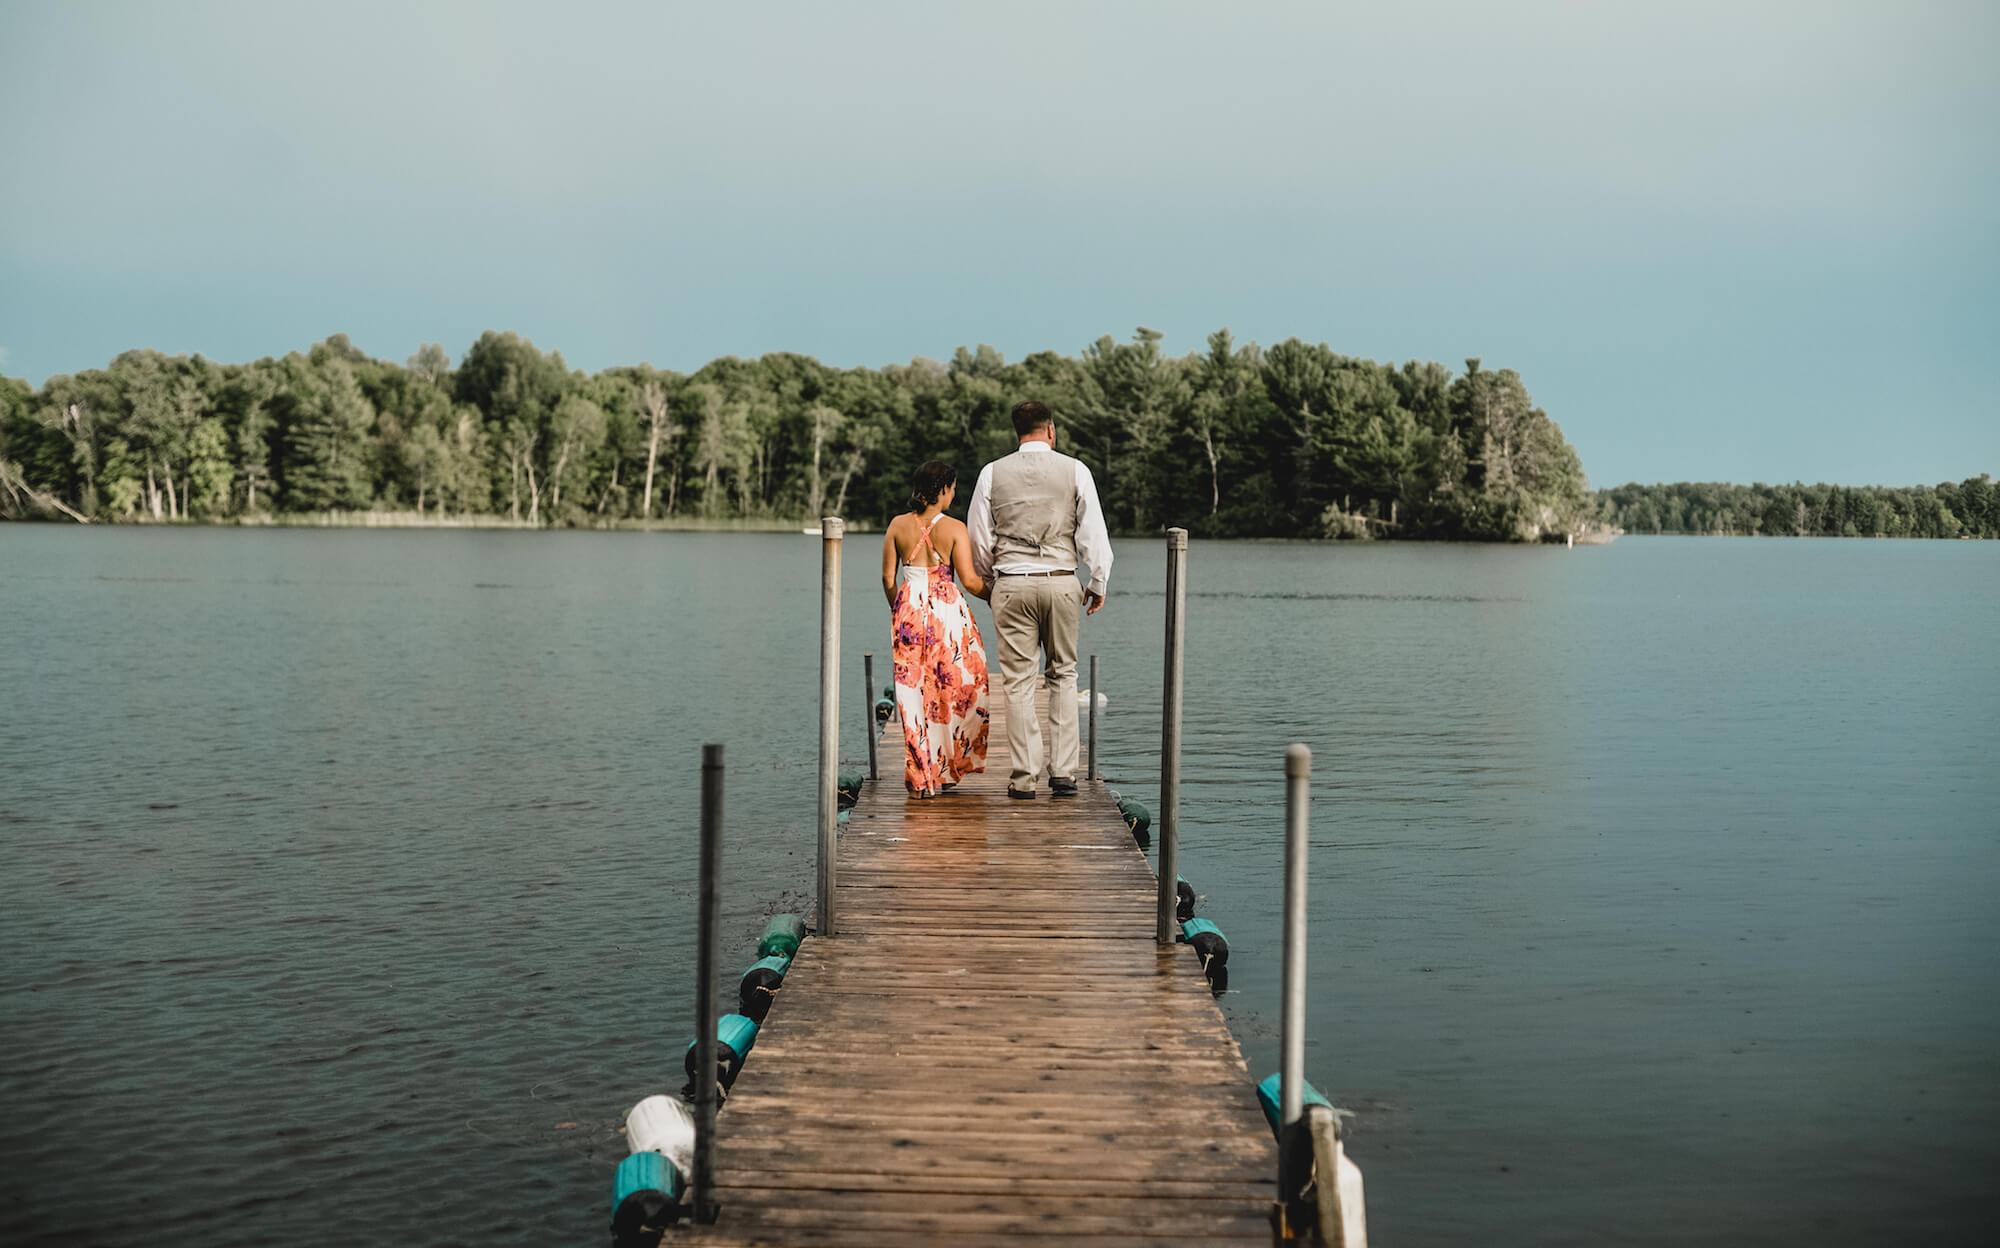 engle-olson-maddy-pat-mn-wedding-photography-43.jpg